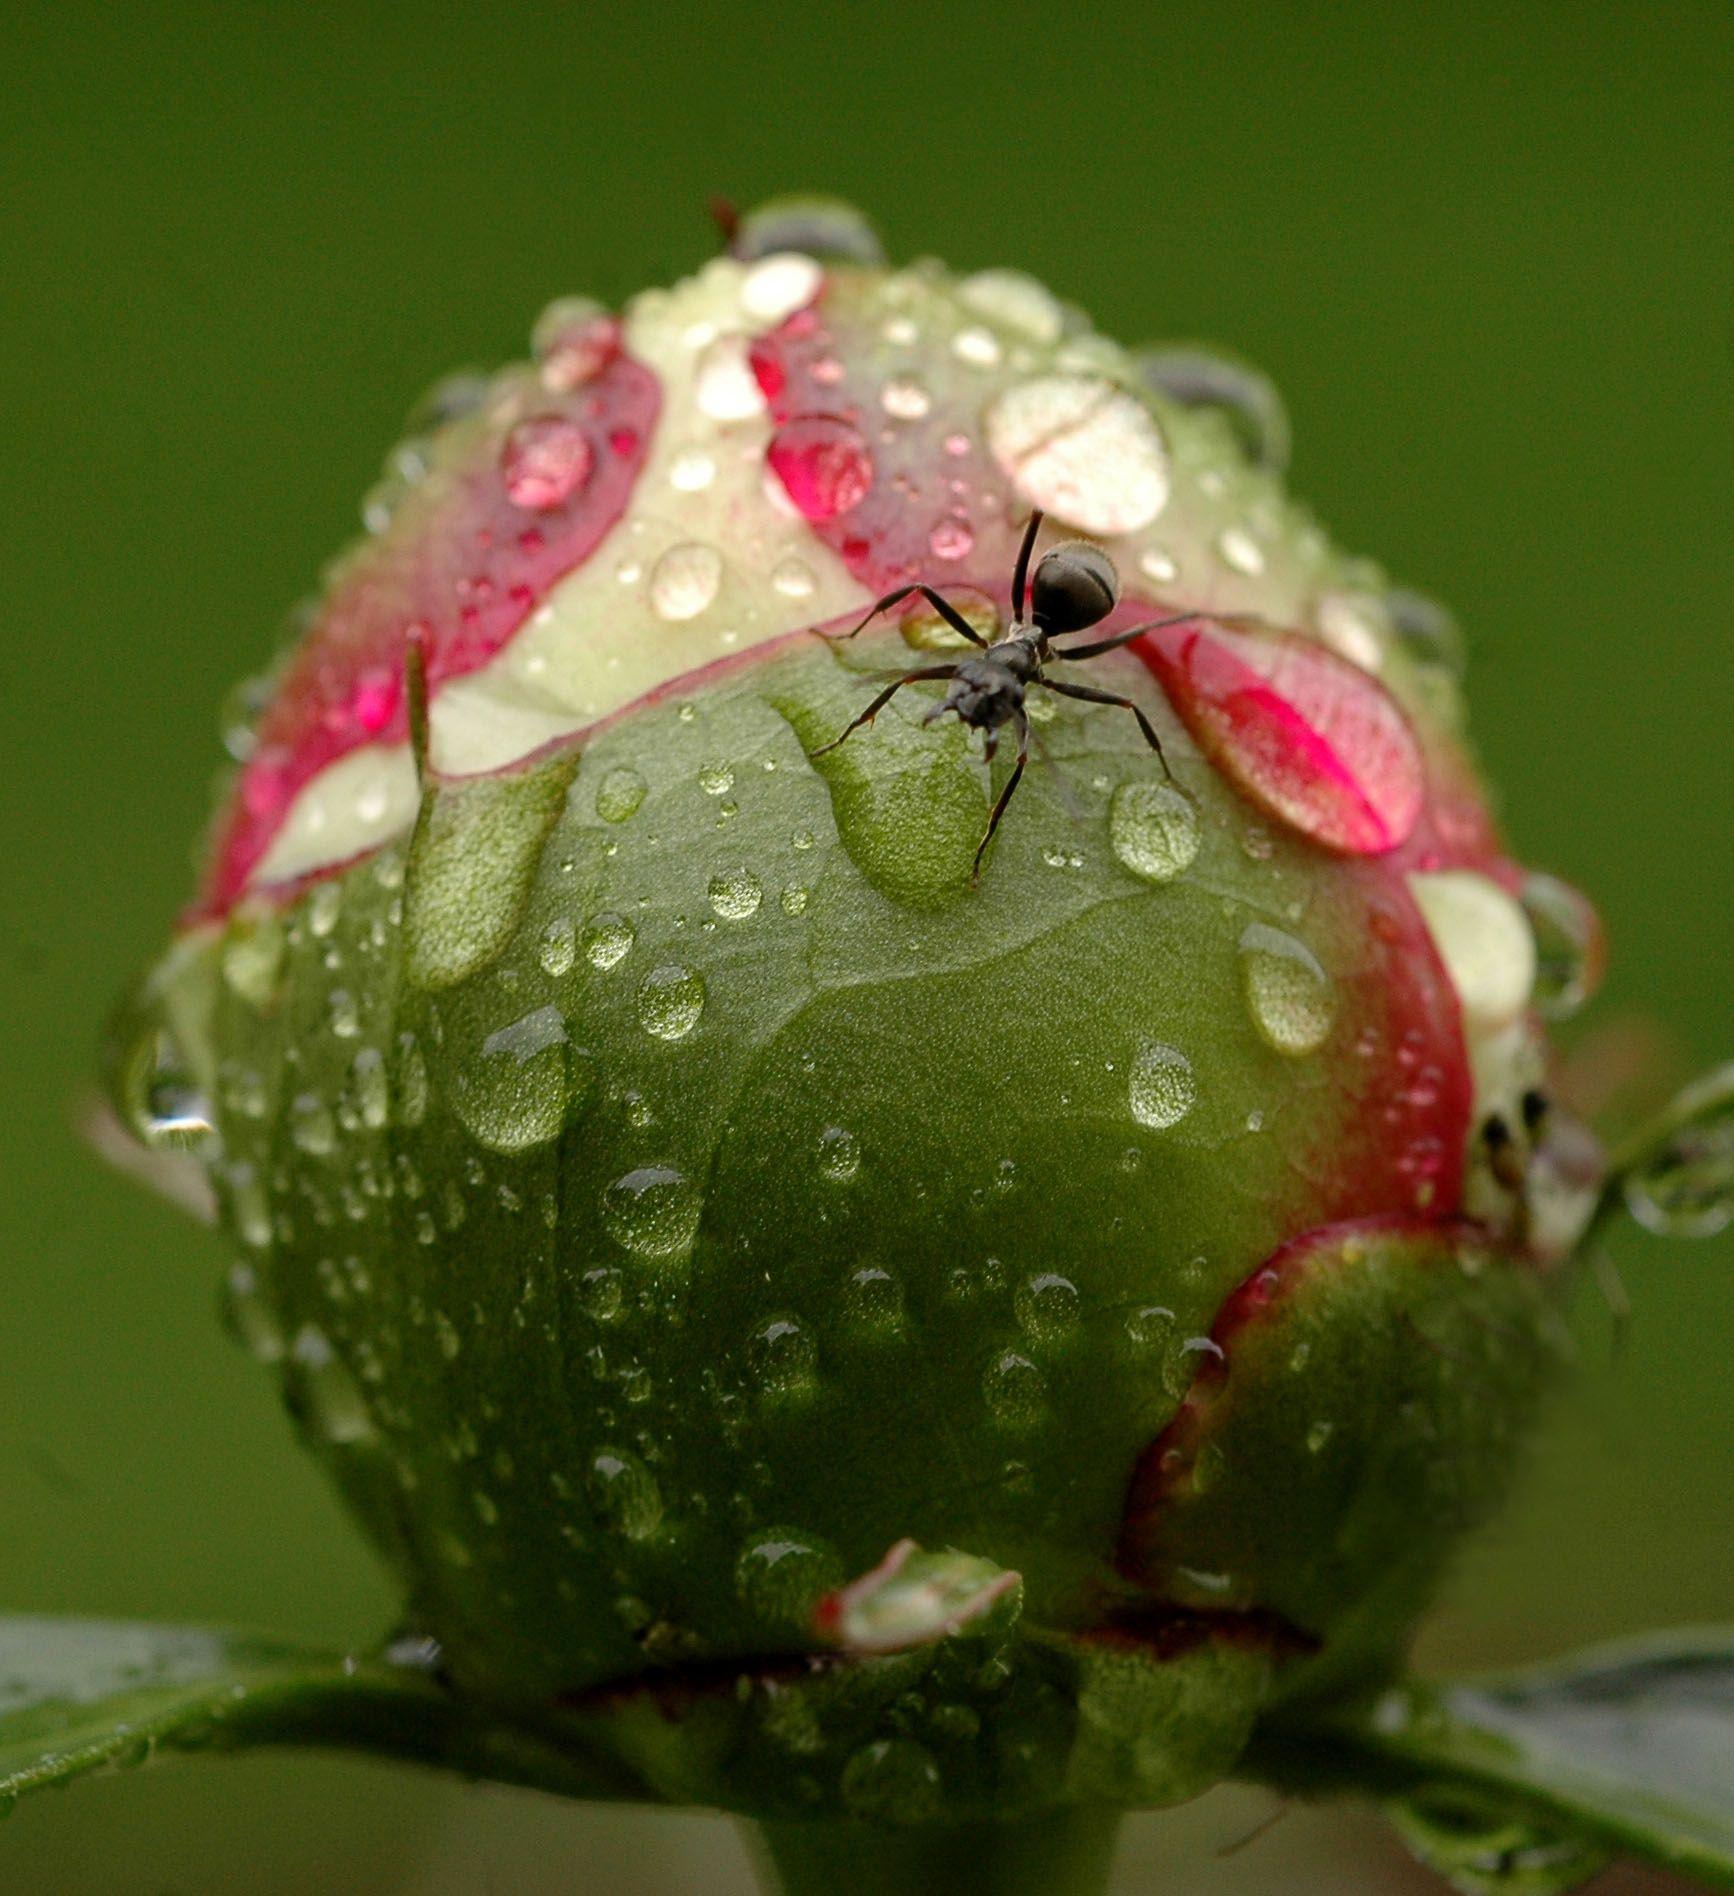 relationship between ants and peonies